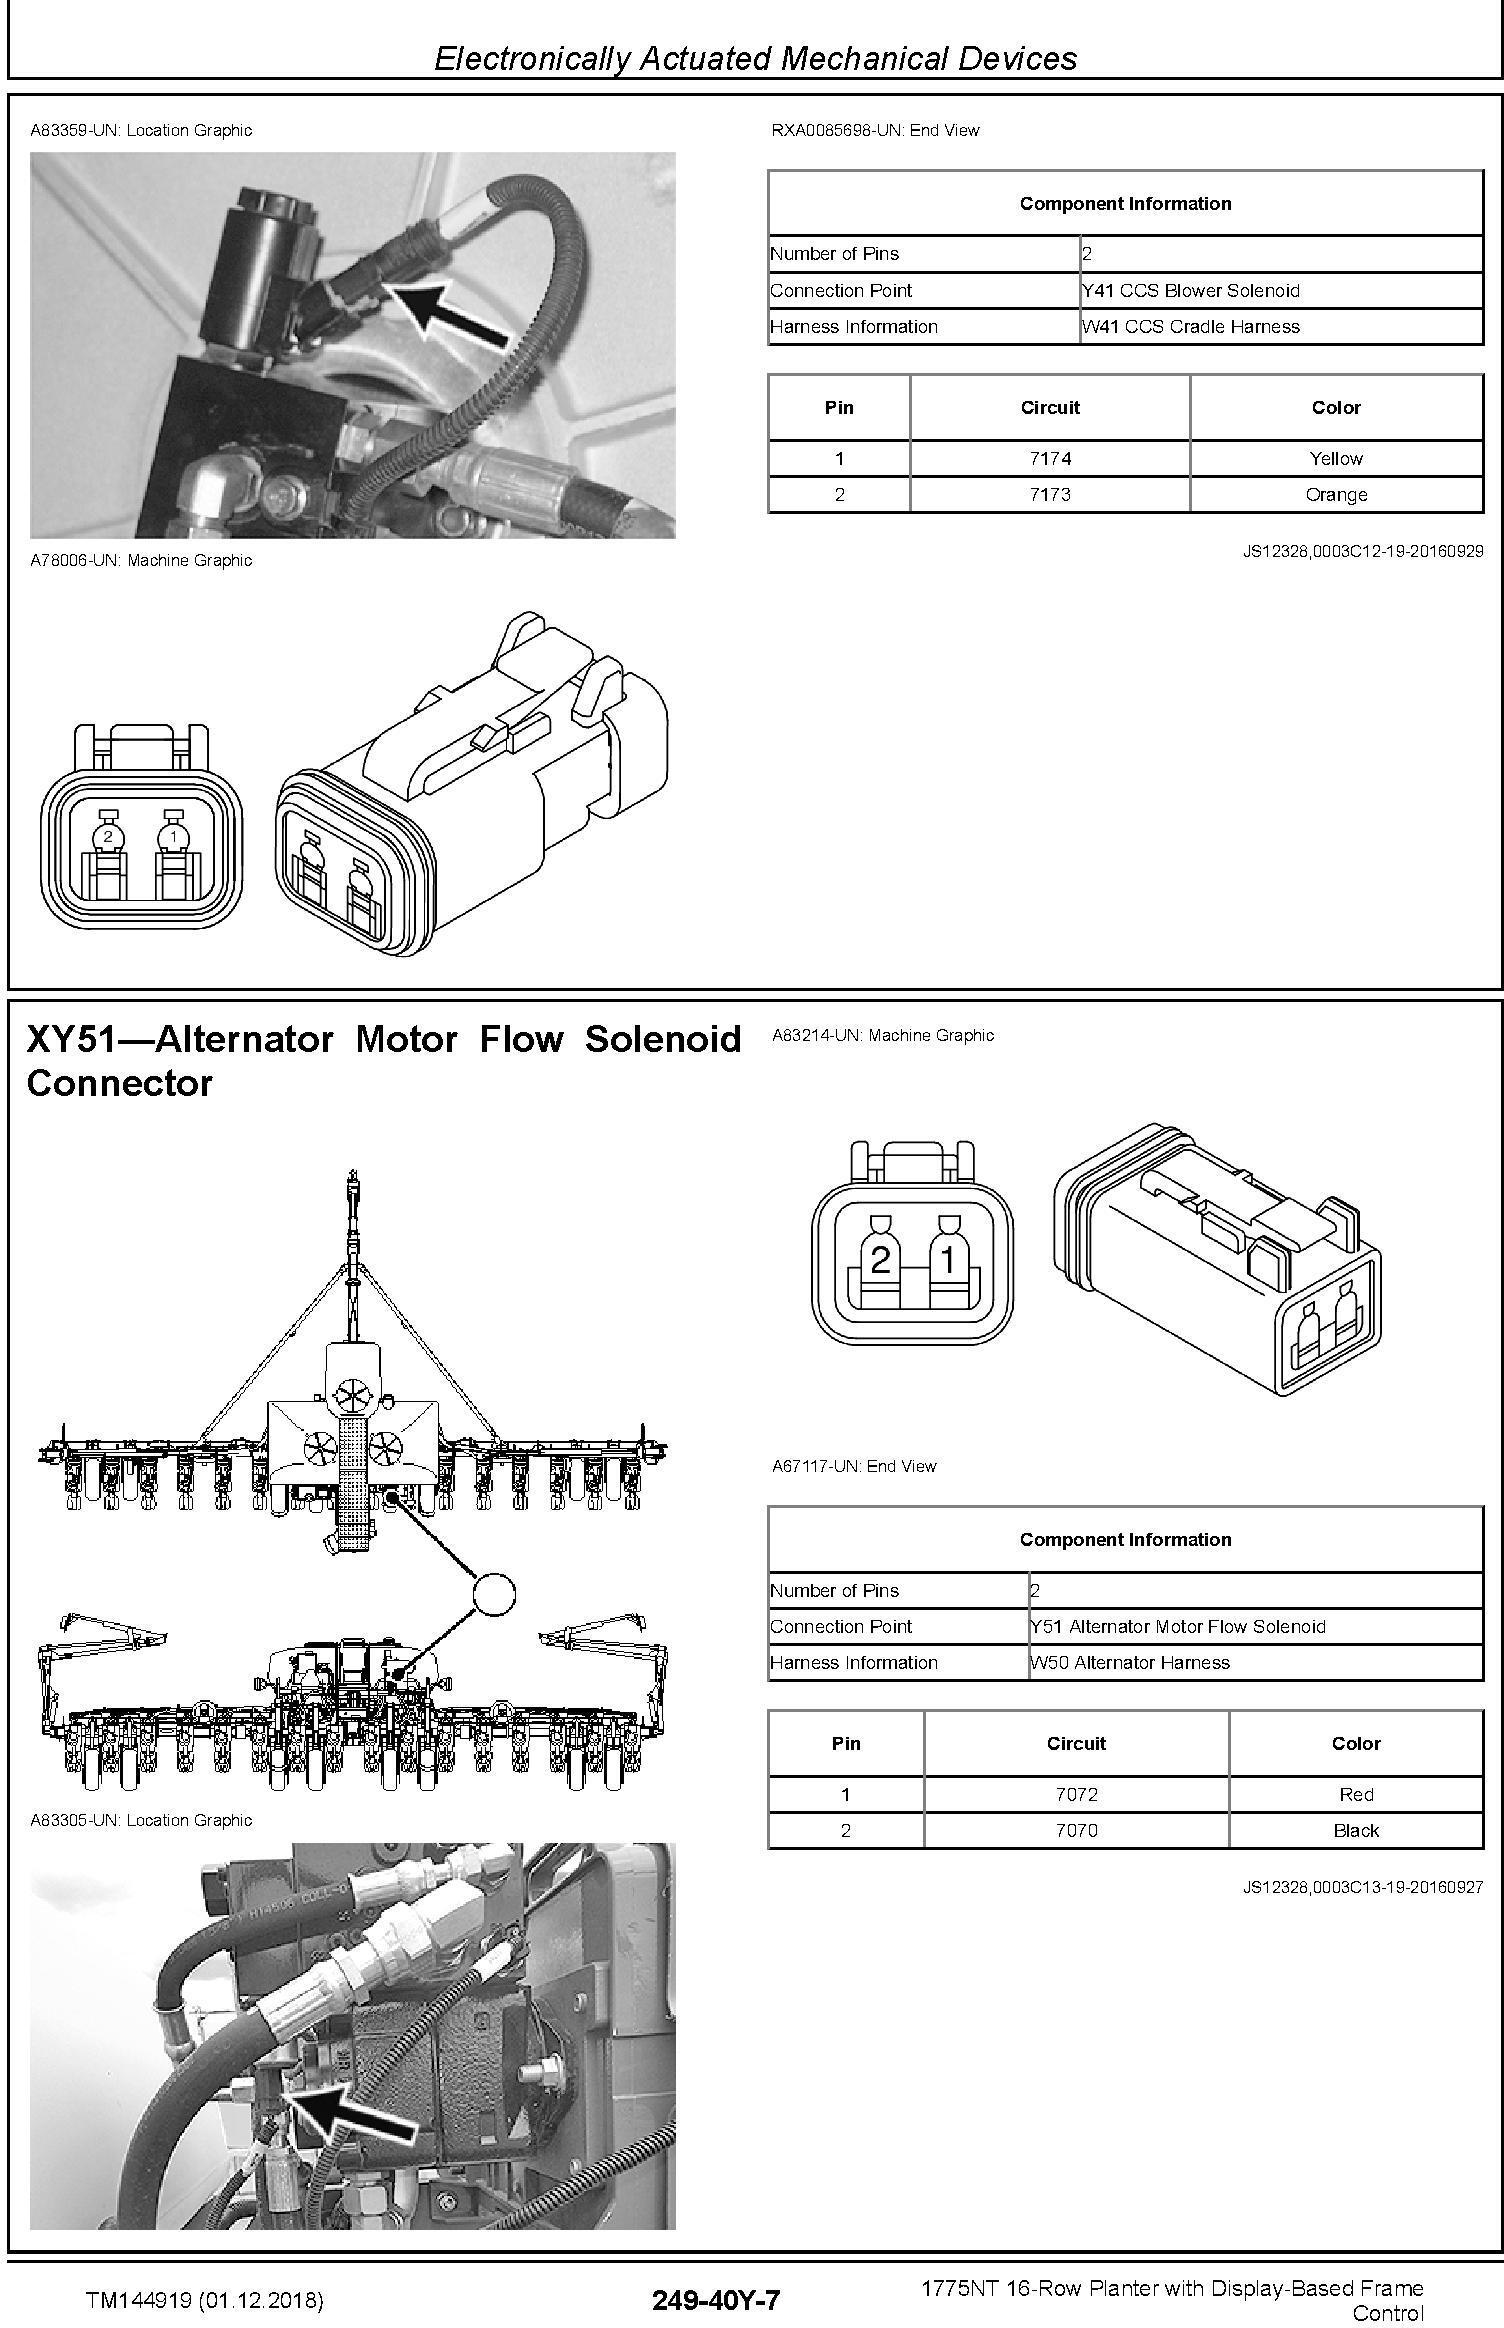 John Deere 1775NT 16row Planter w.Display-Based Frame Control Diagnostic Technical Manual (TM144919) - 2